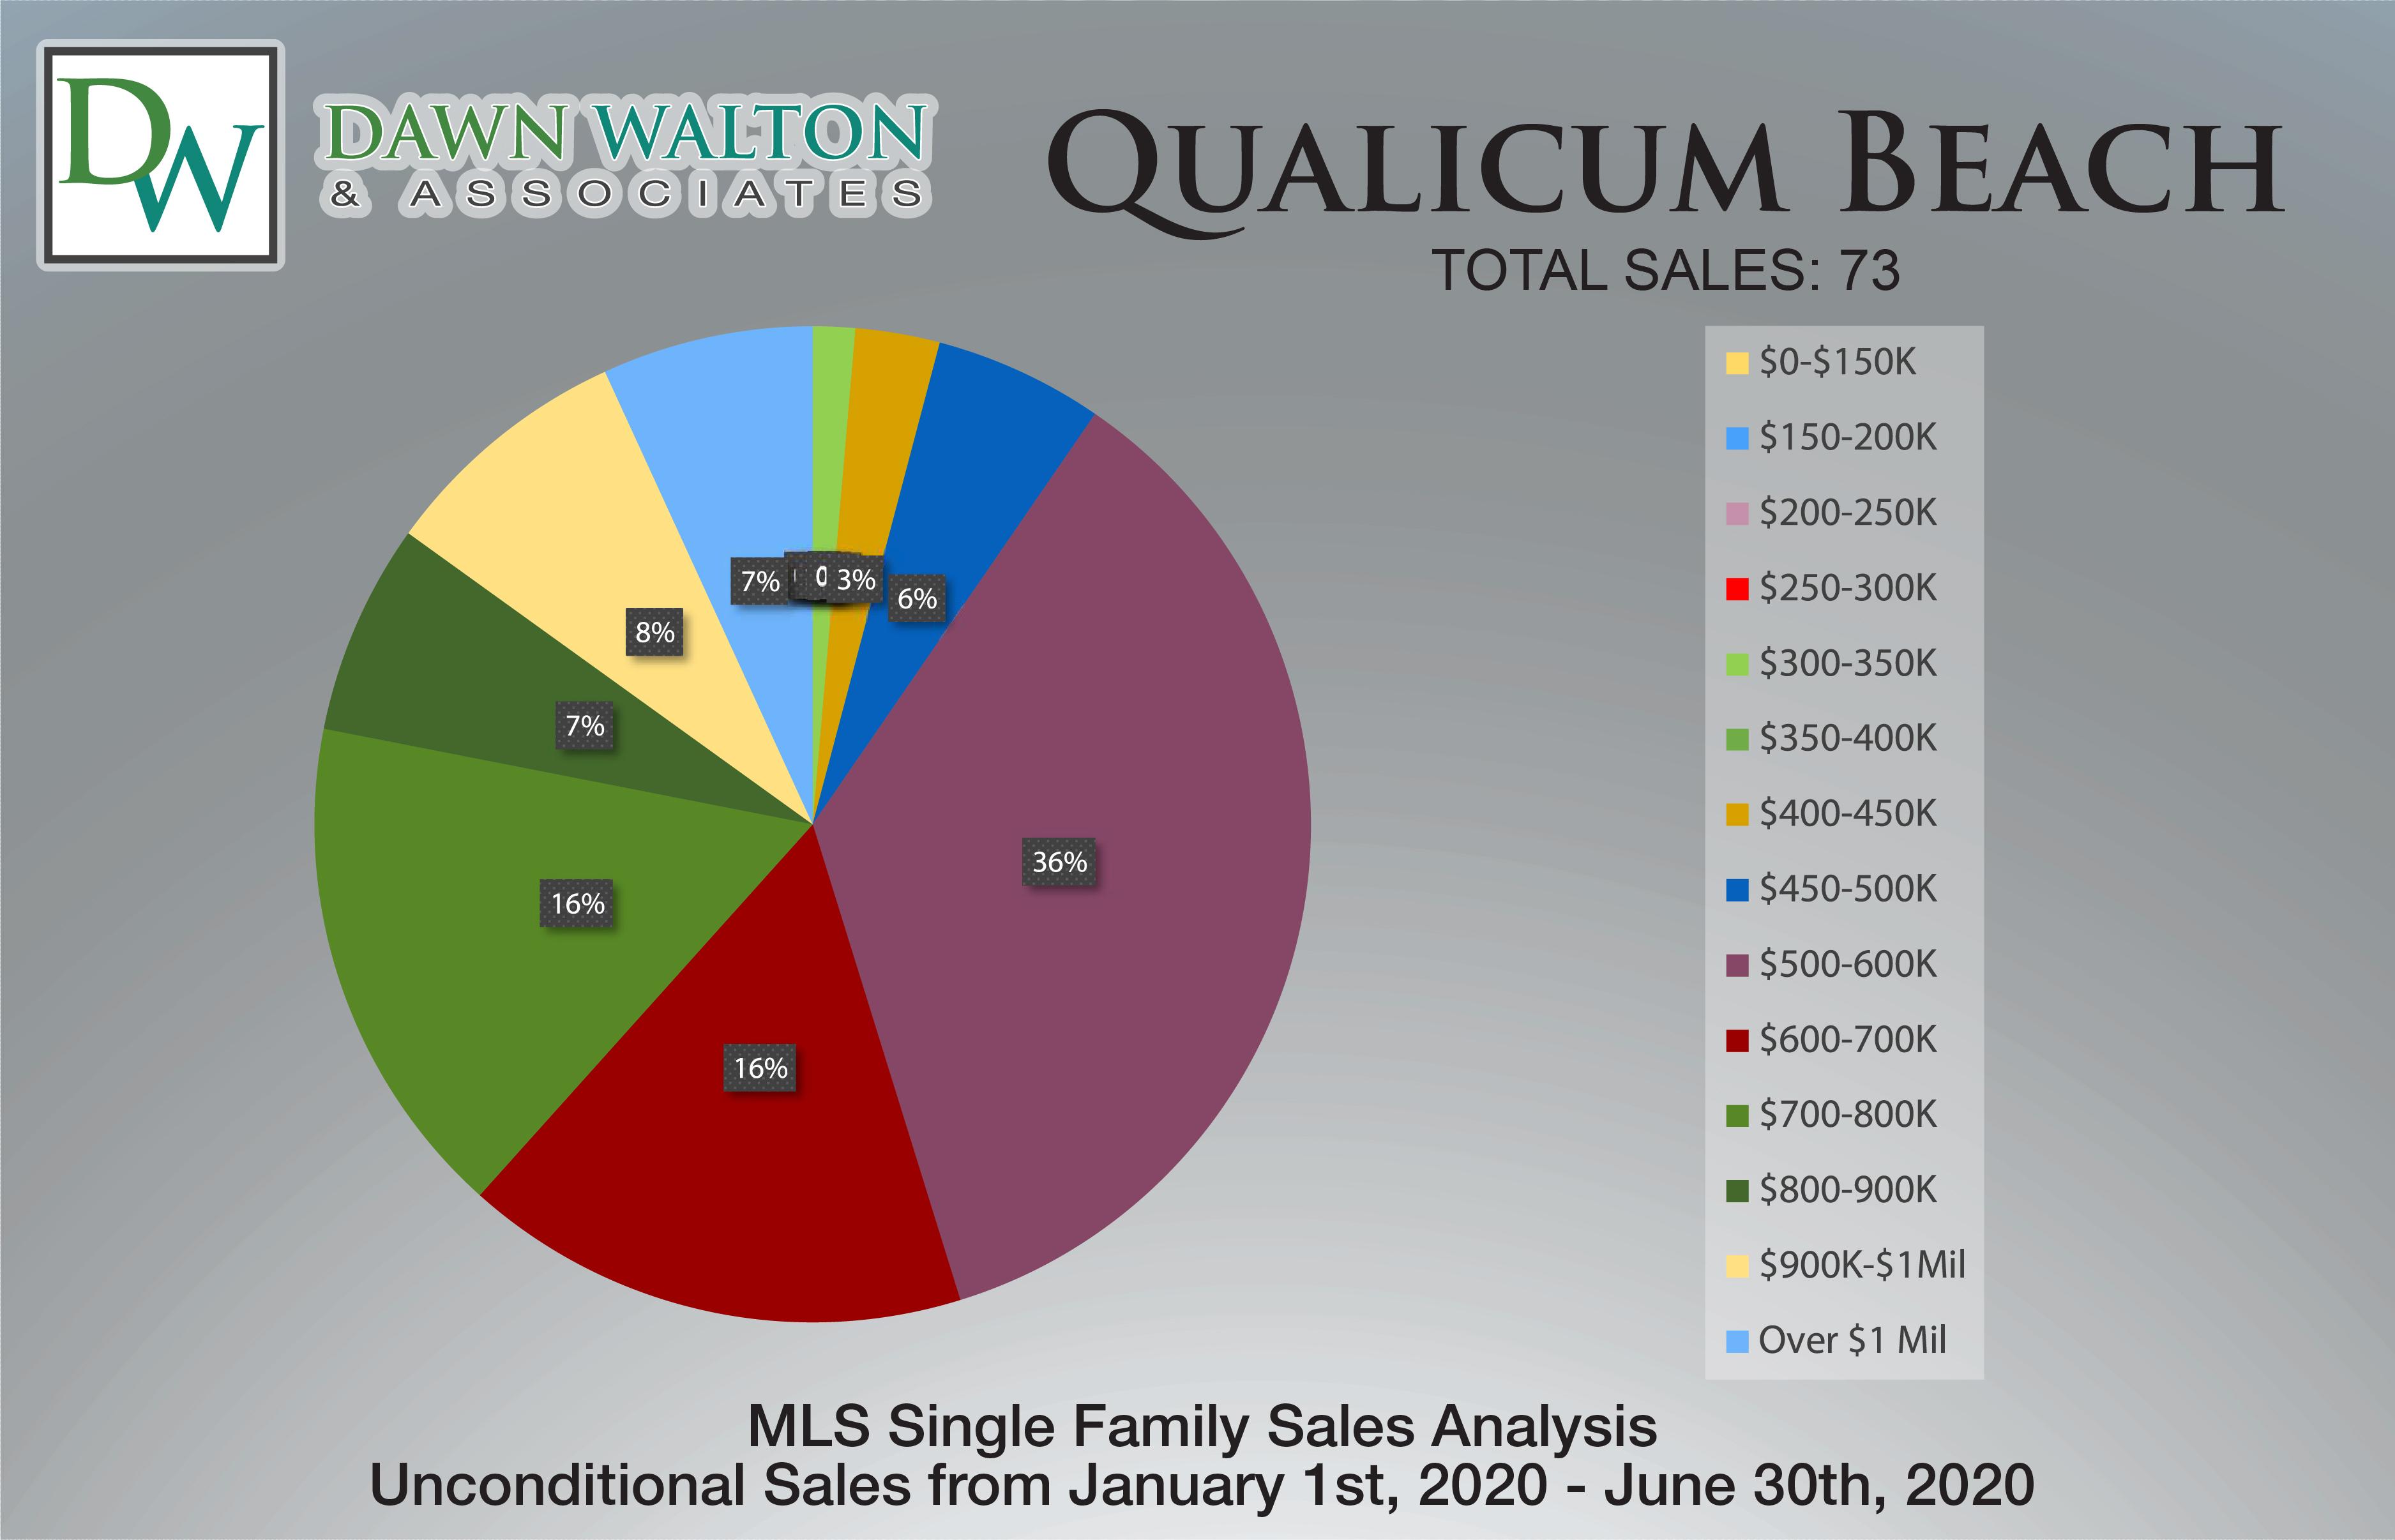 Qualicum Beach Real Estate Market Stats Price Percentage Jan 1- June 30th  2020 - Nanaimo Realtor Dawn Walton